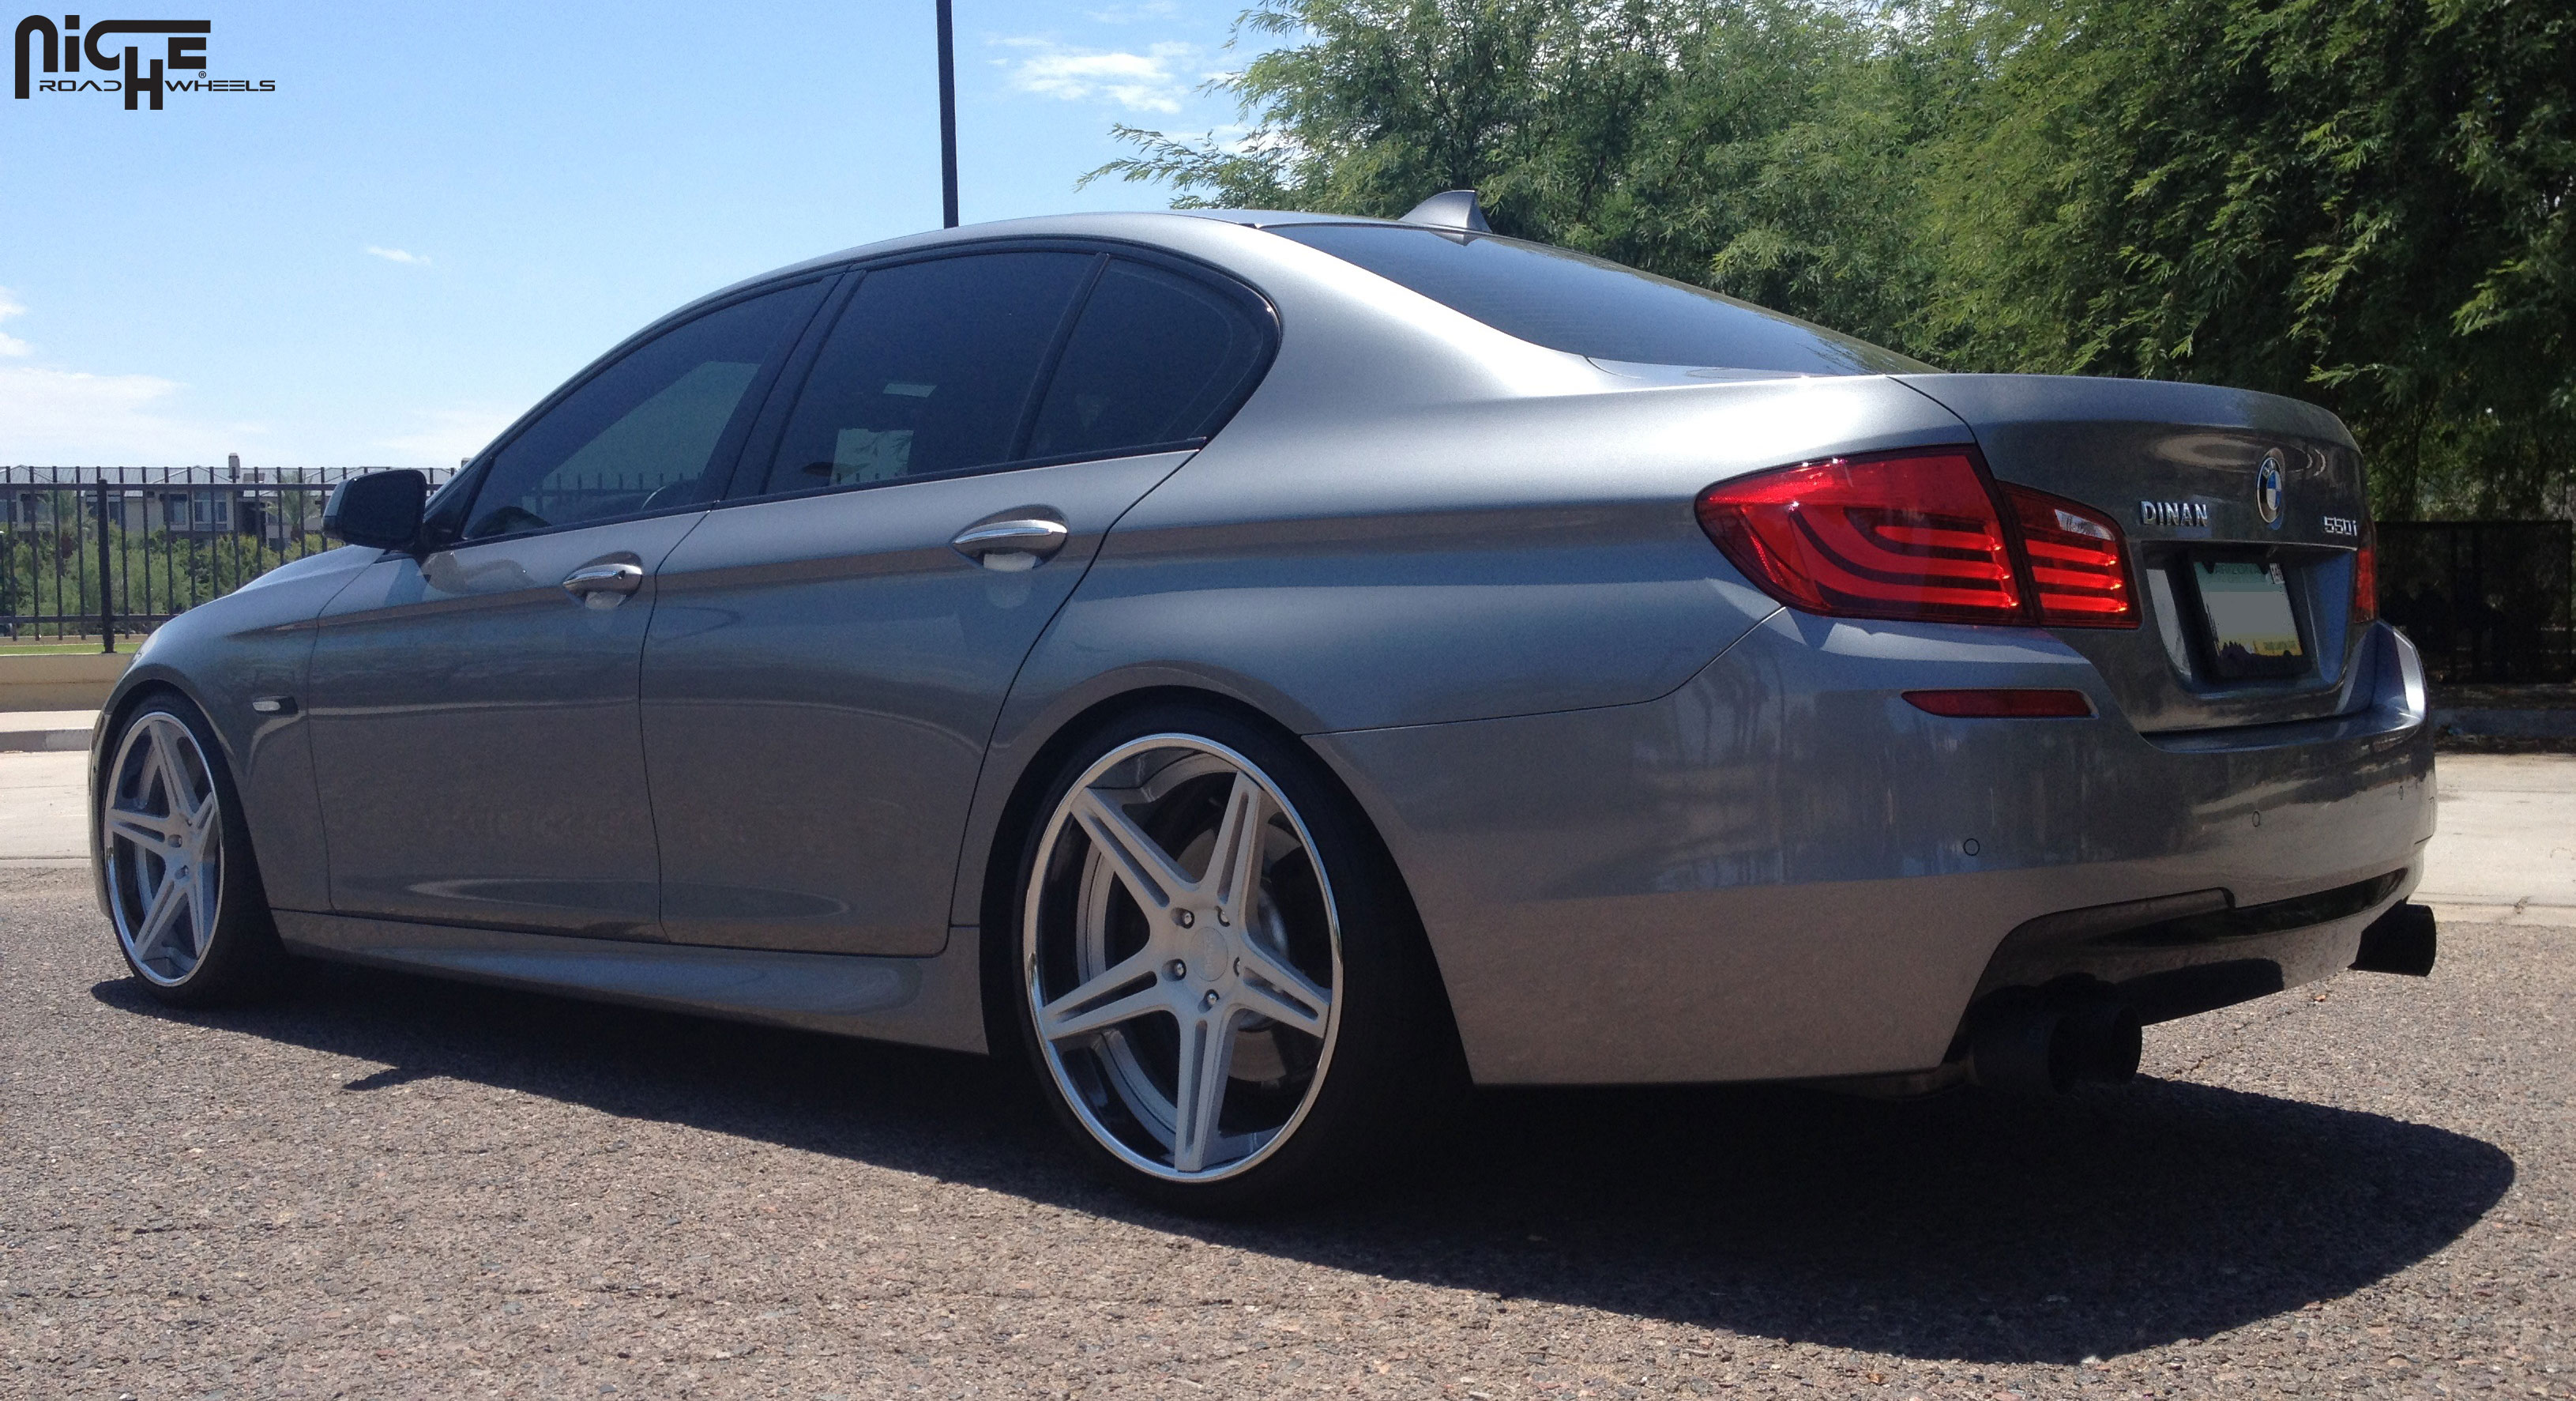 Car BMW Series On Niche Forged Sportiva Wheels California Wheels - Bmw 550i sport package